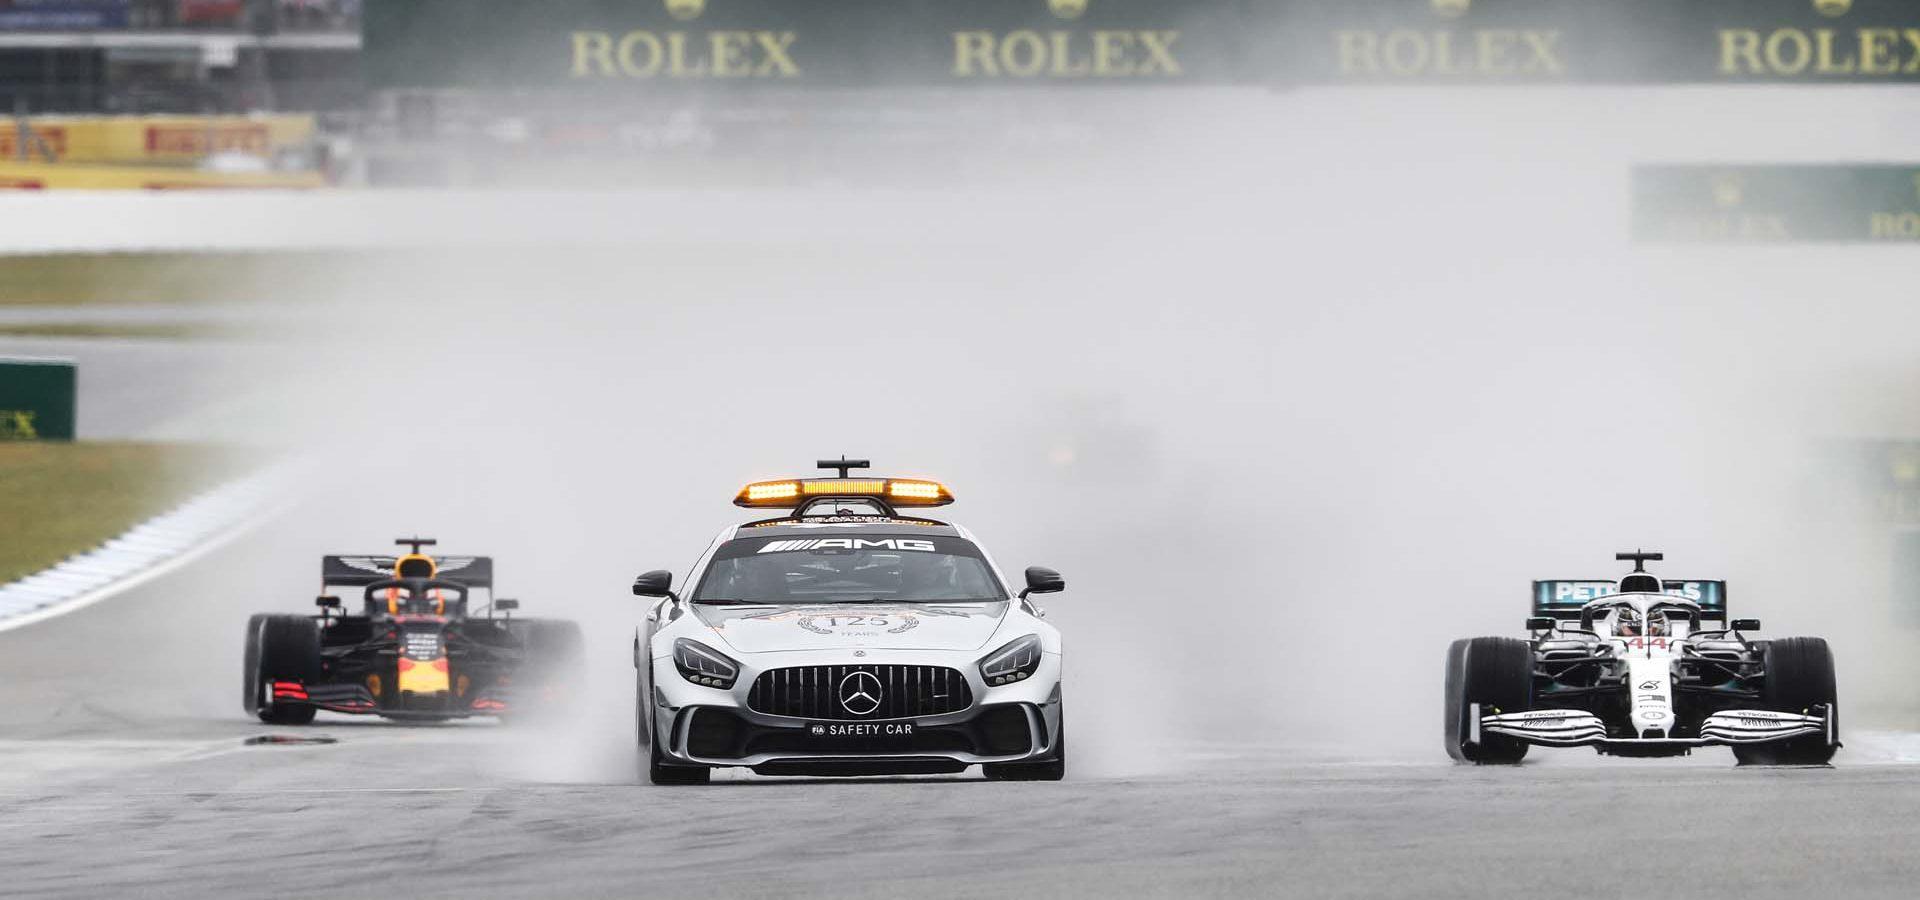 2019 German Grand Prix, Sunday - LAT Images Safety Car Mercedes Lewis Hamilton